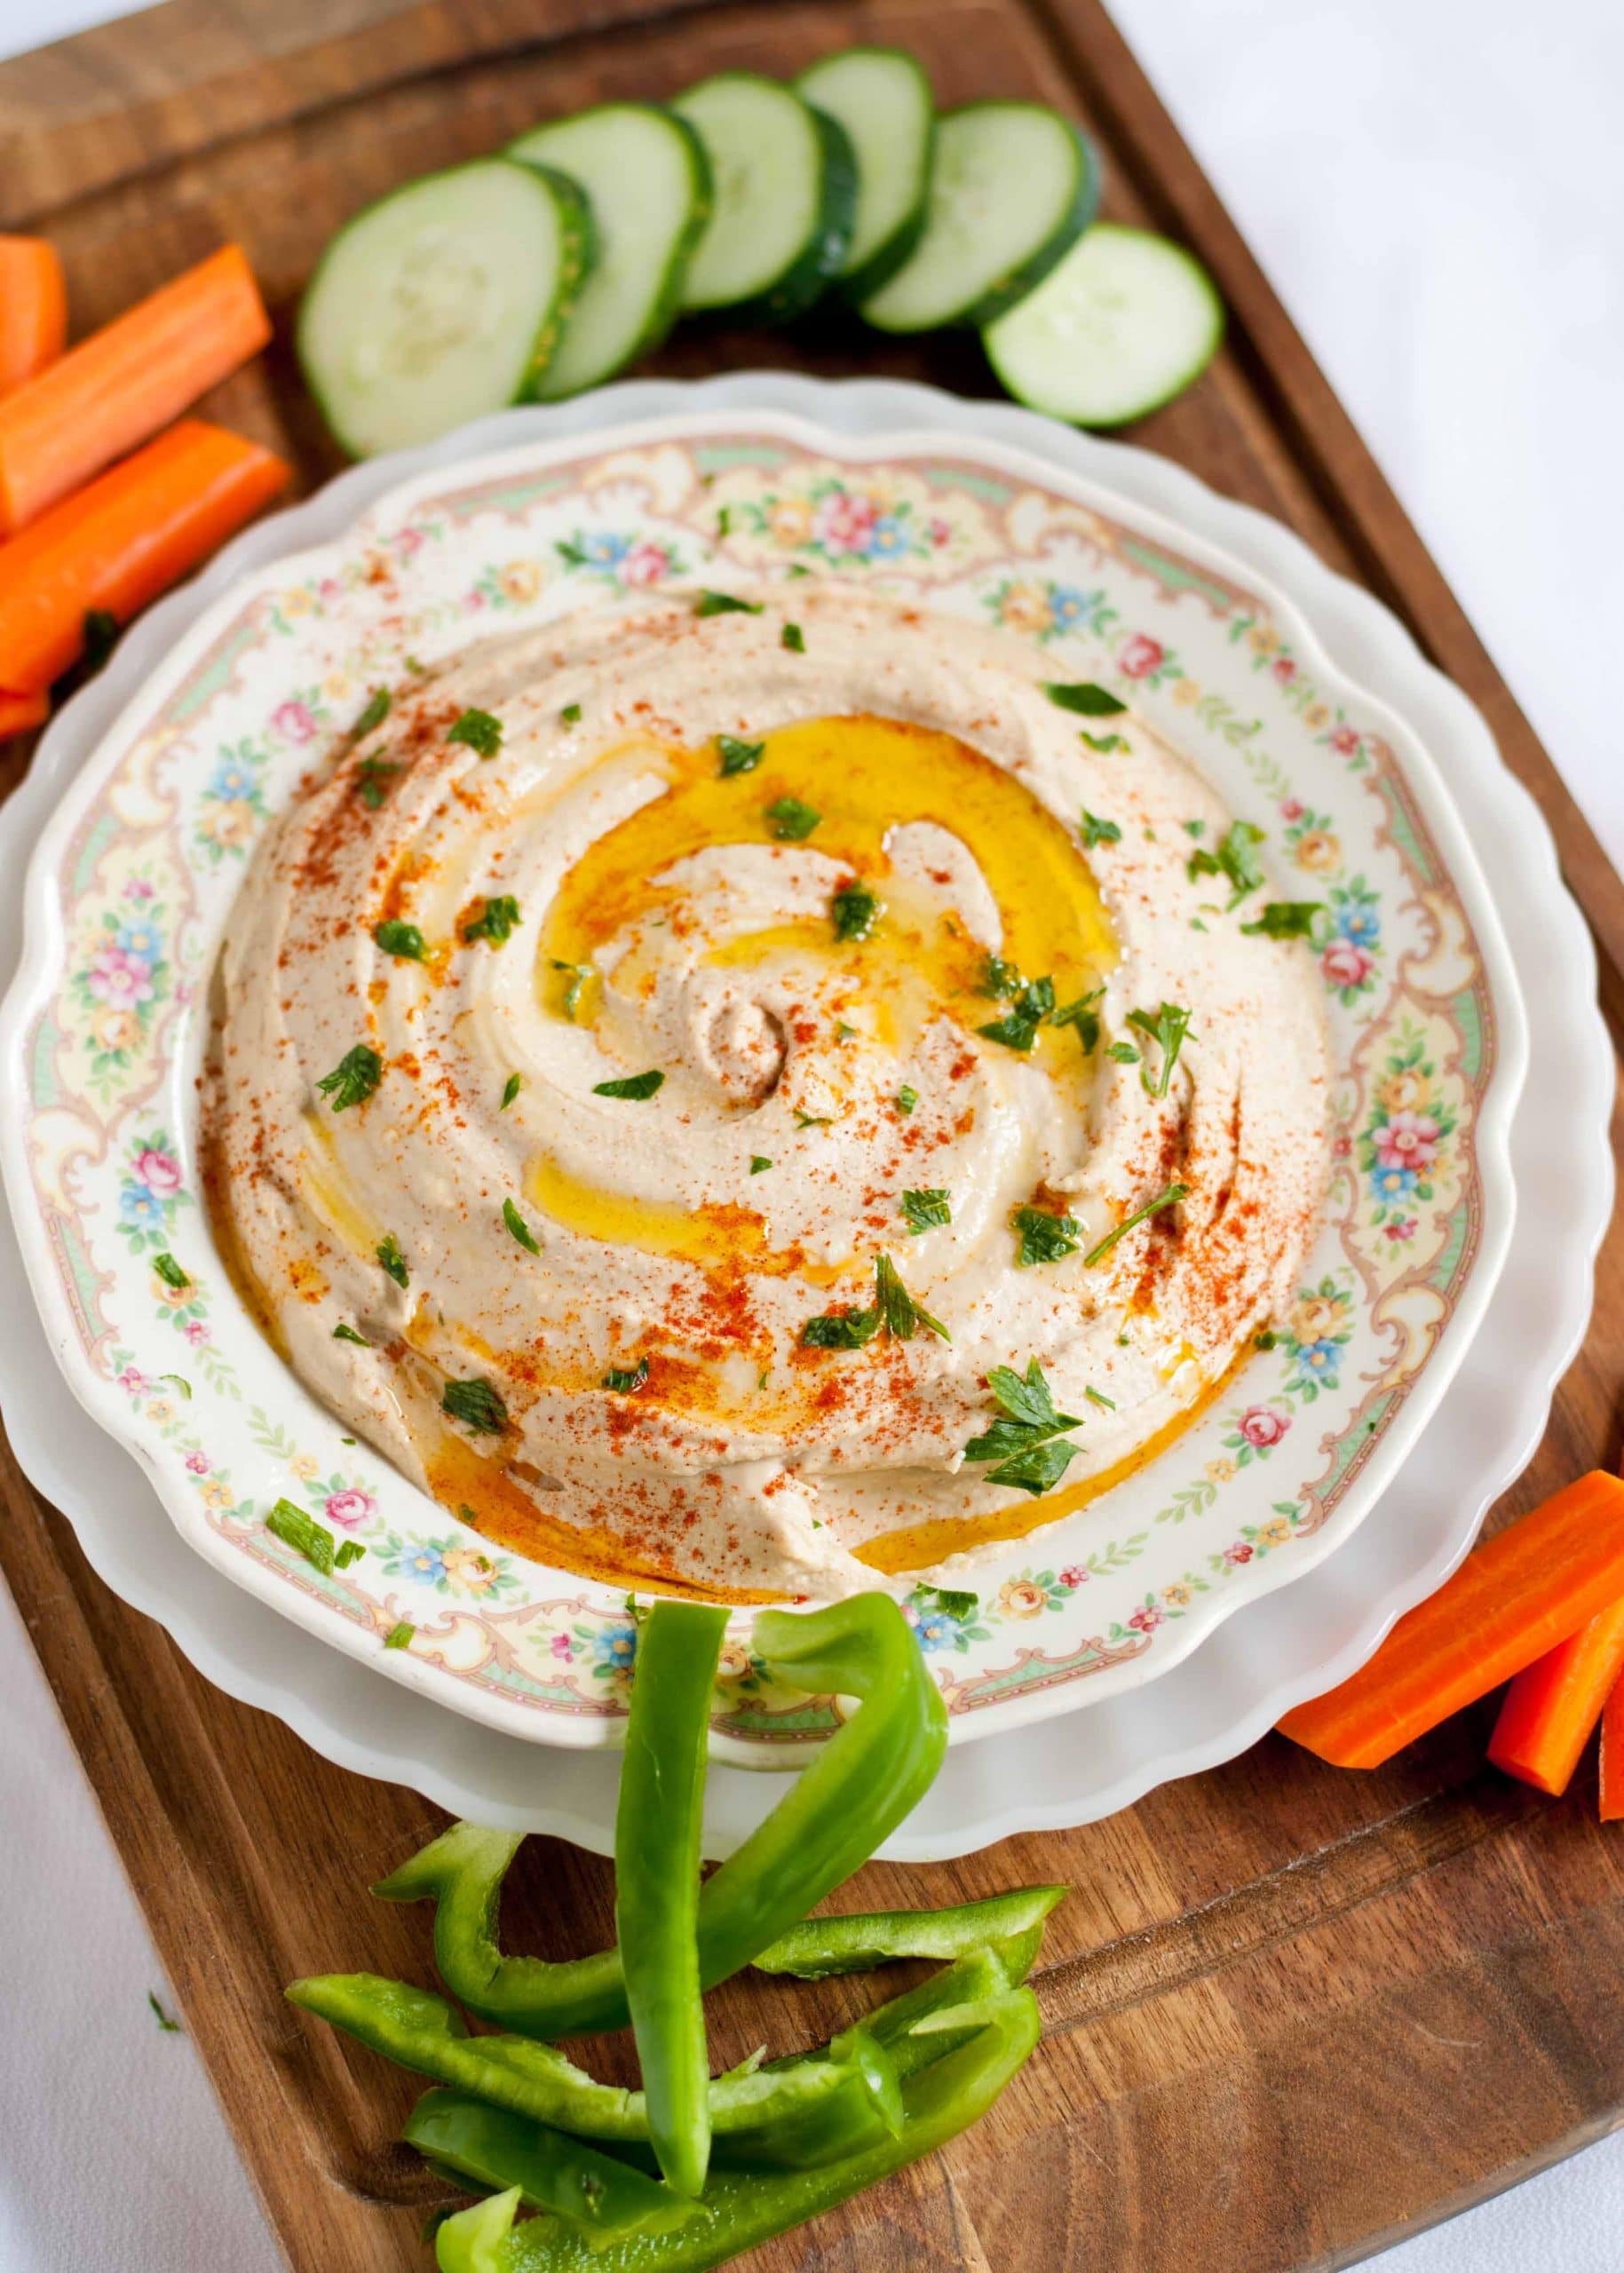 How To Make Ultra Smooth, Creamy Hummus   Neighborfoodblog.com